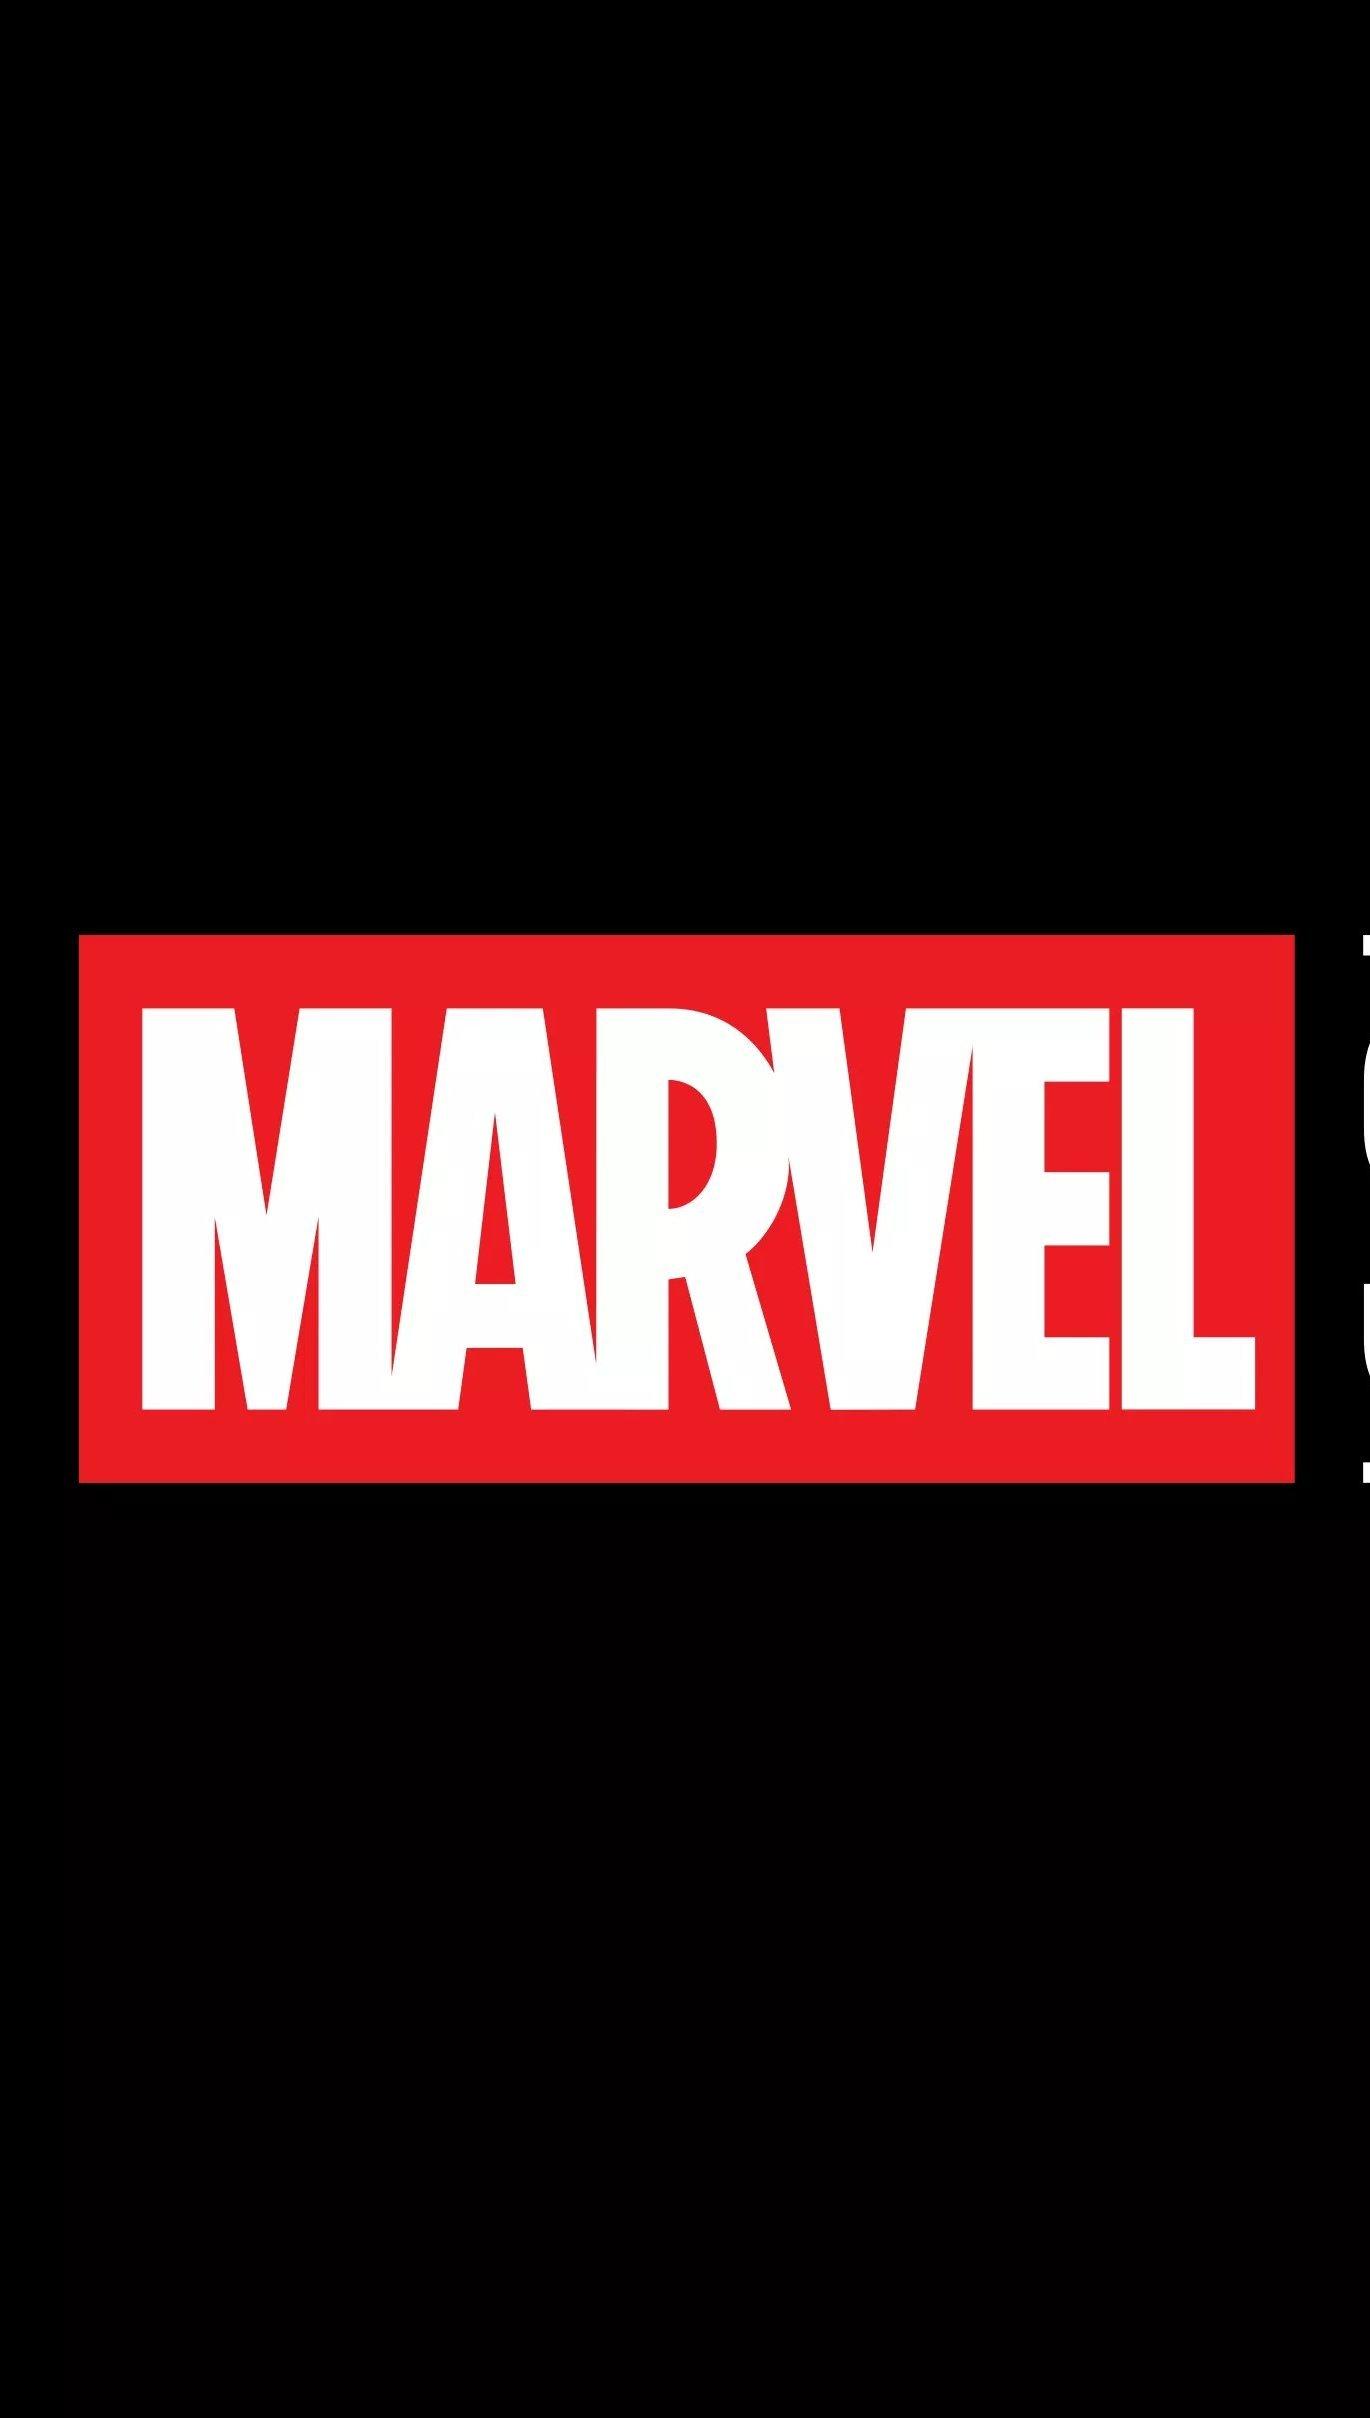 Wallpaper Marvel Studios New Logo Vertical